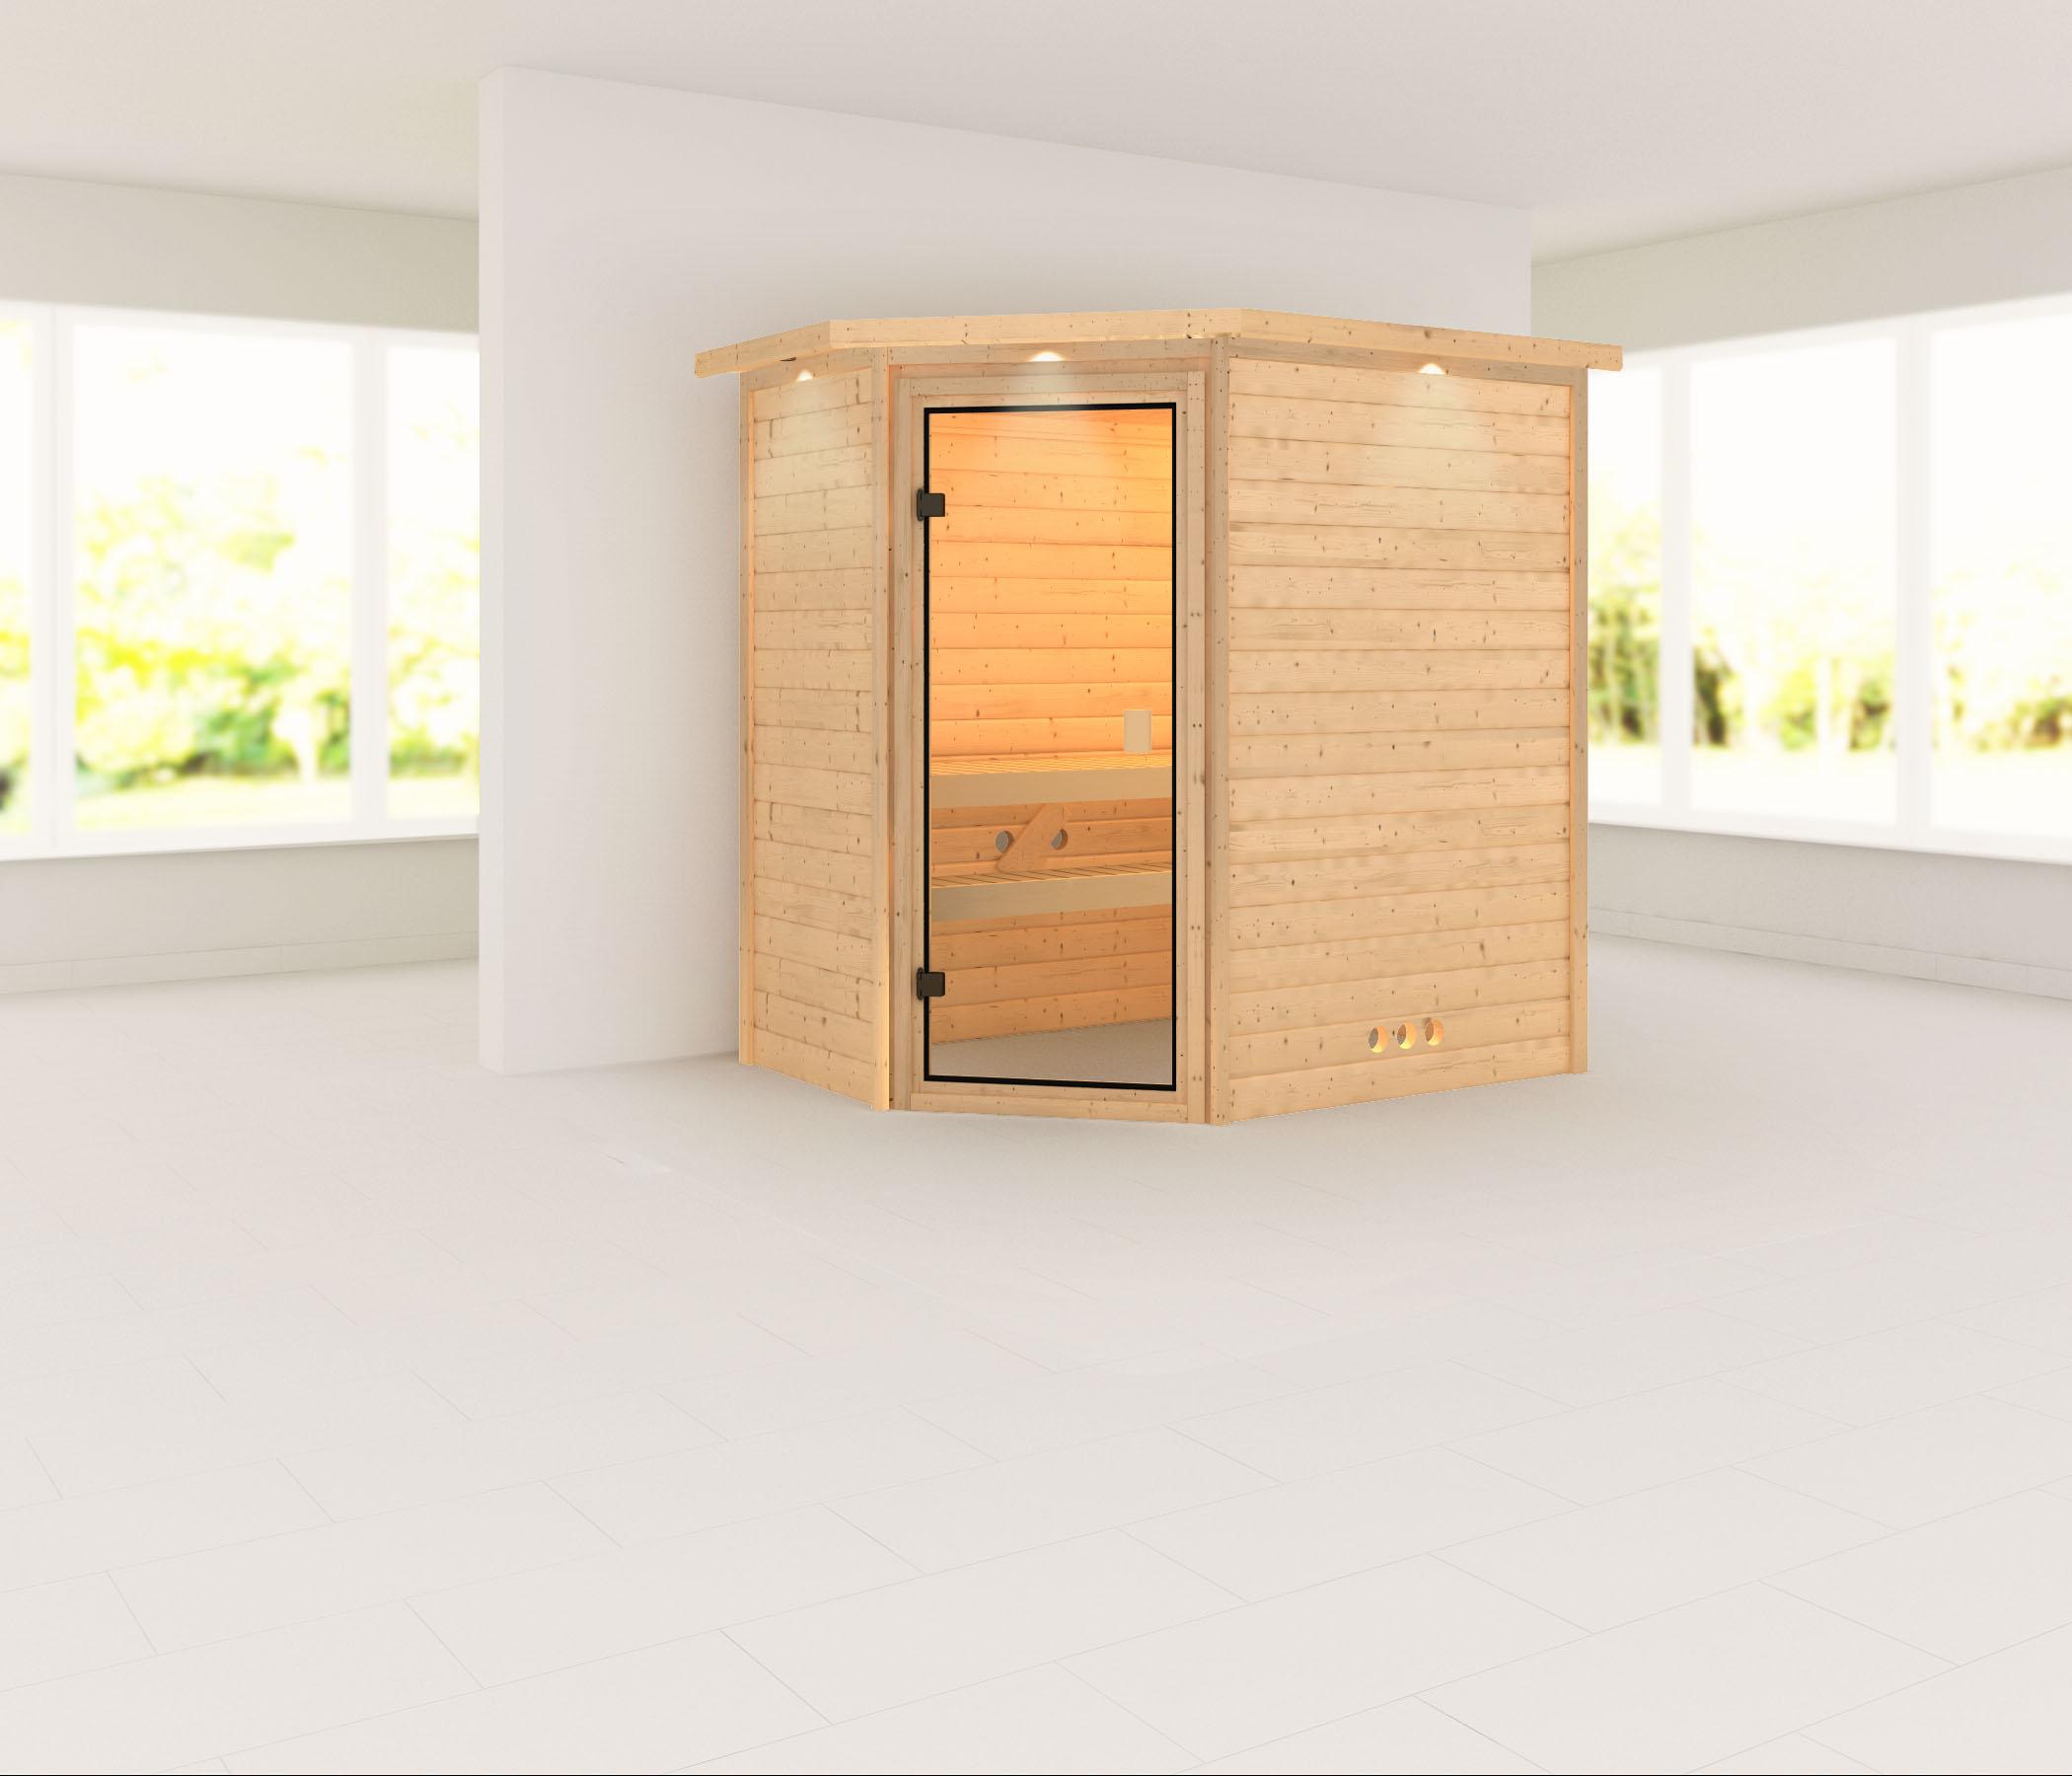 karibu sauna cilja welche sauna kaufen. Black Bedroom Furniture Sets. Home Design Ideas